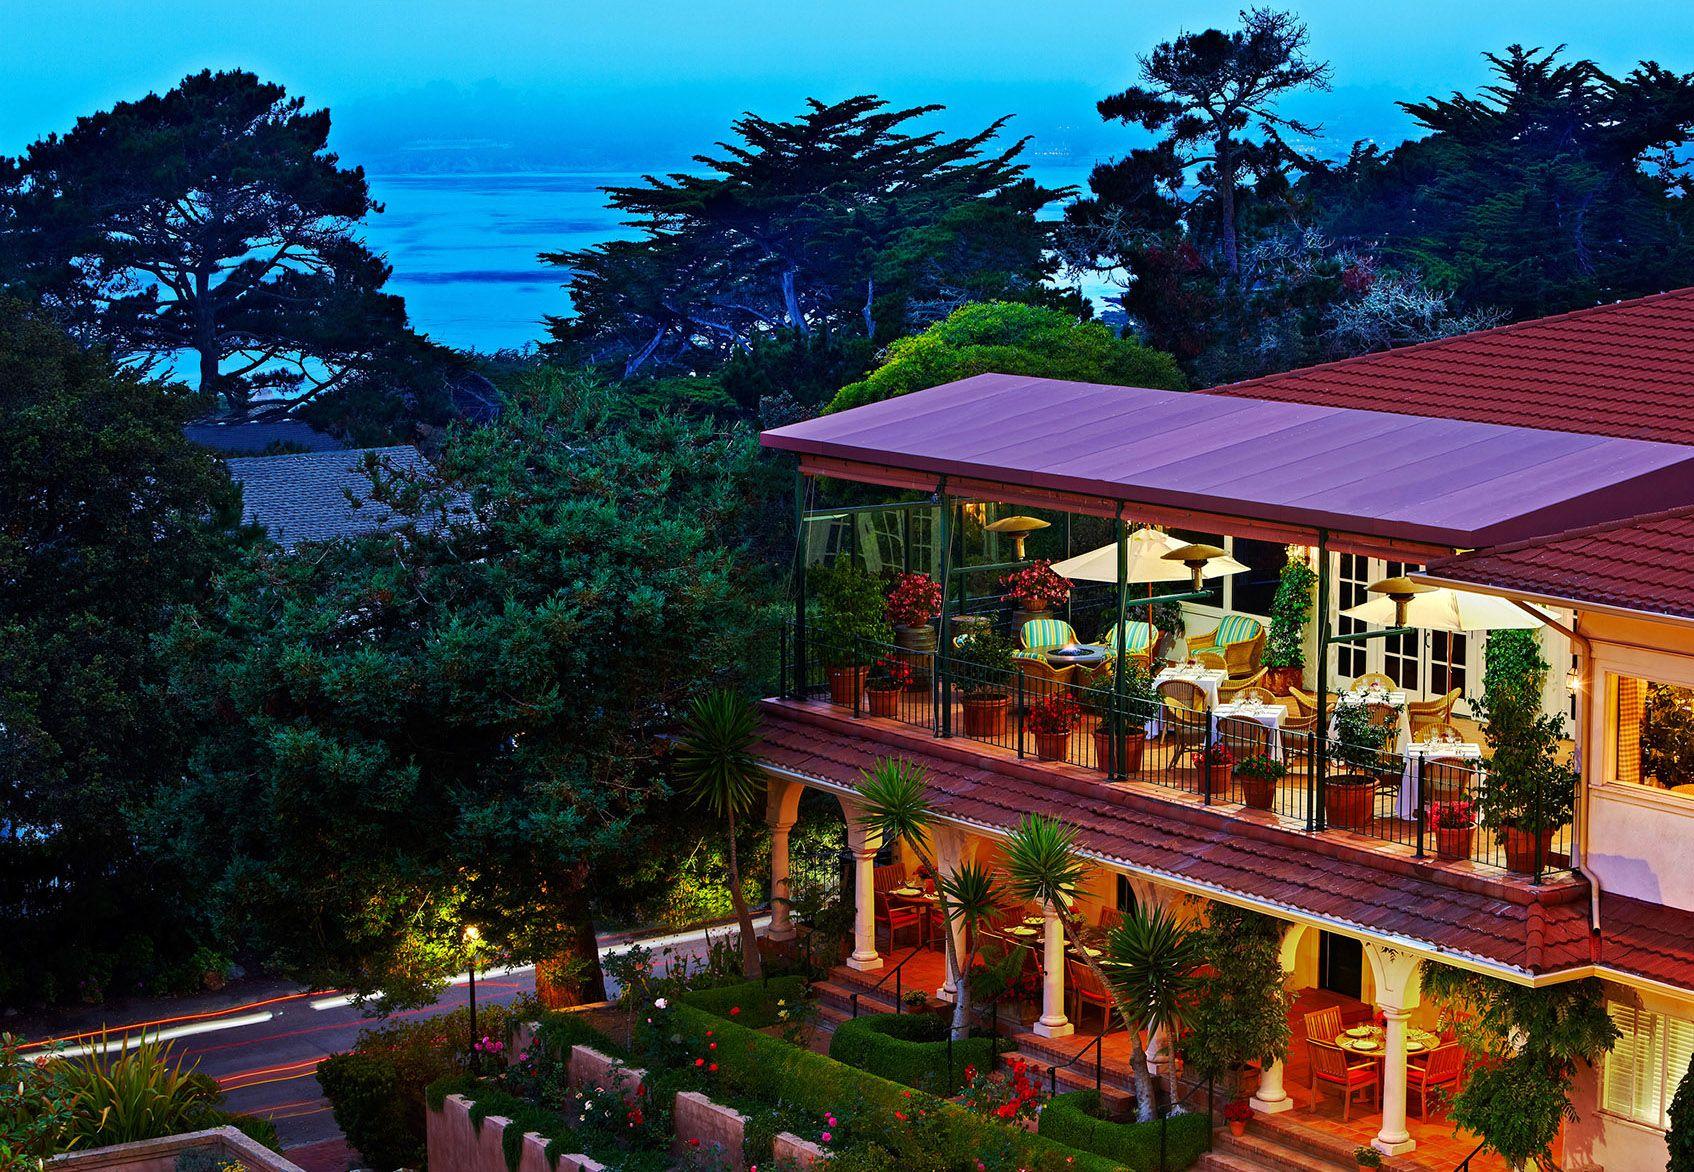 Gorgeous Spanish Style Hotel Carmel California Hotels Near Monterey Bay La Playa By